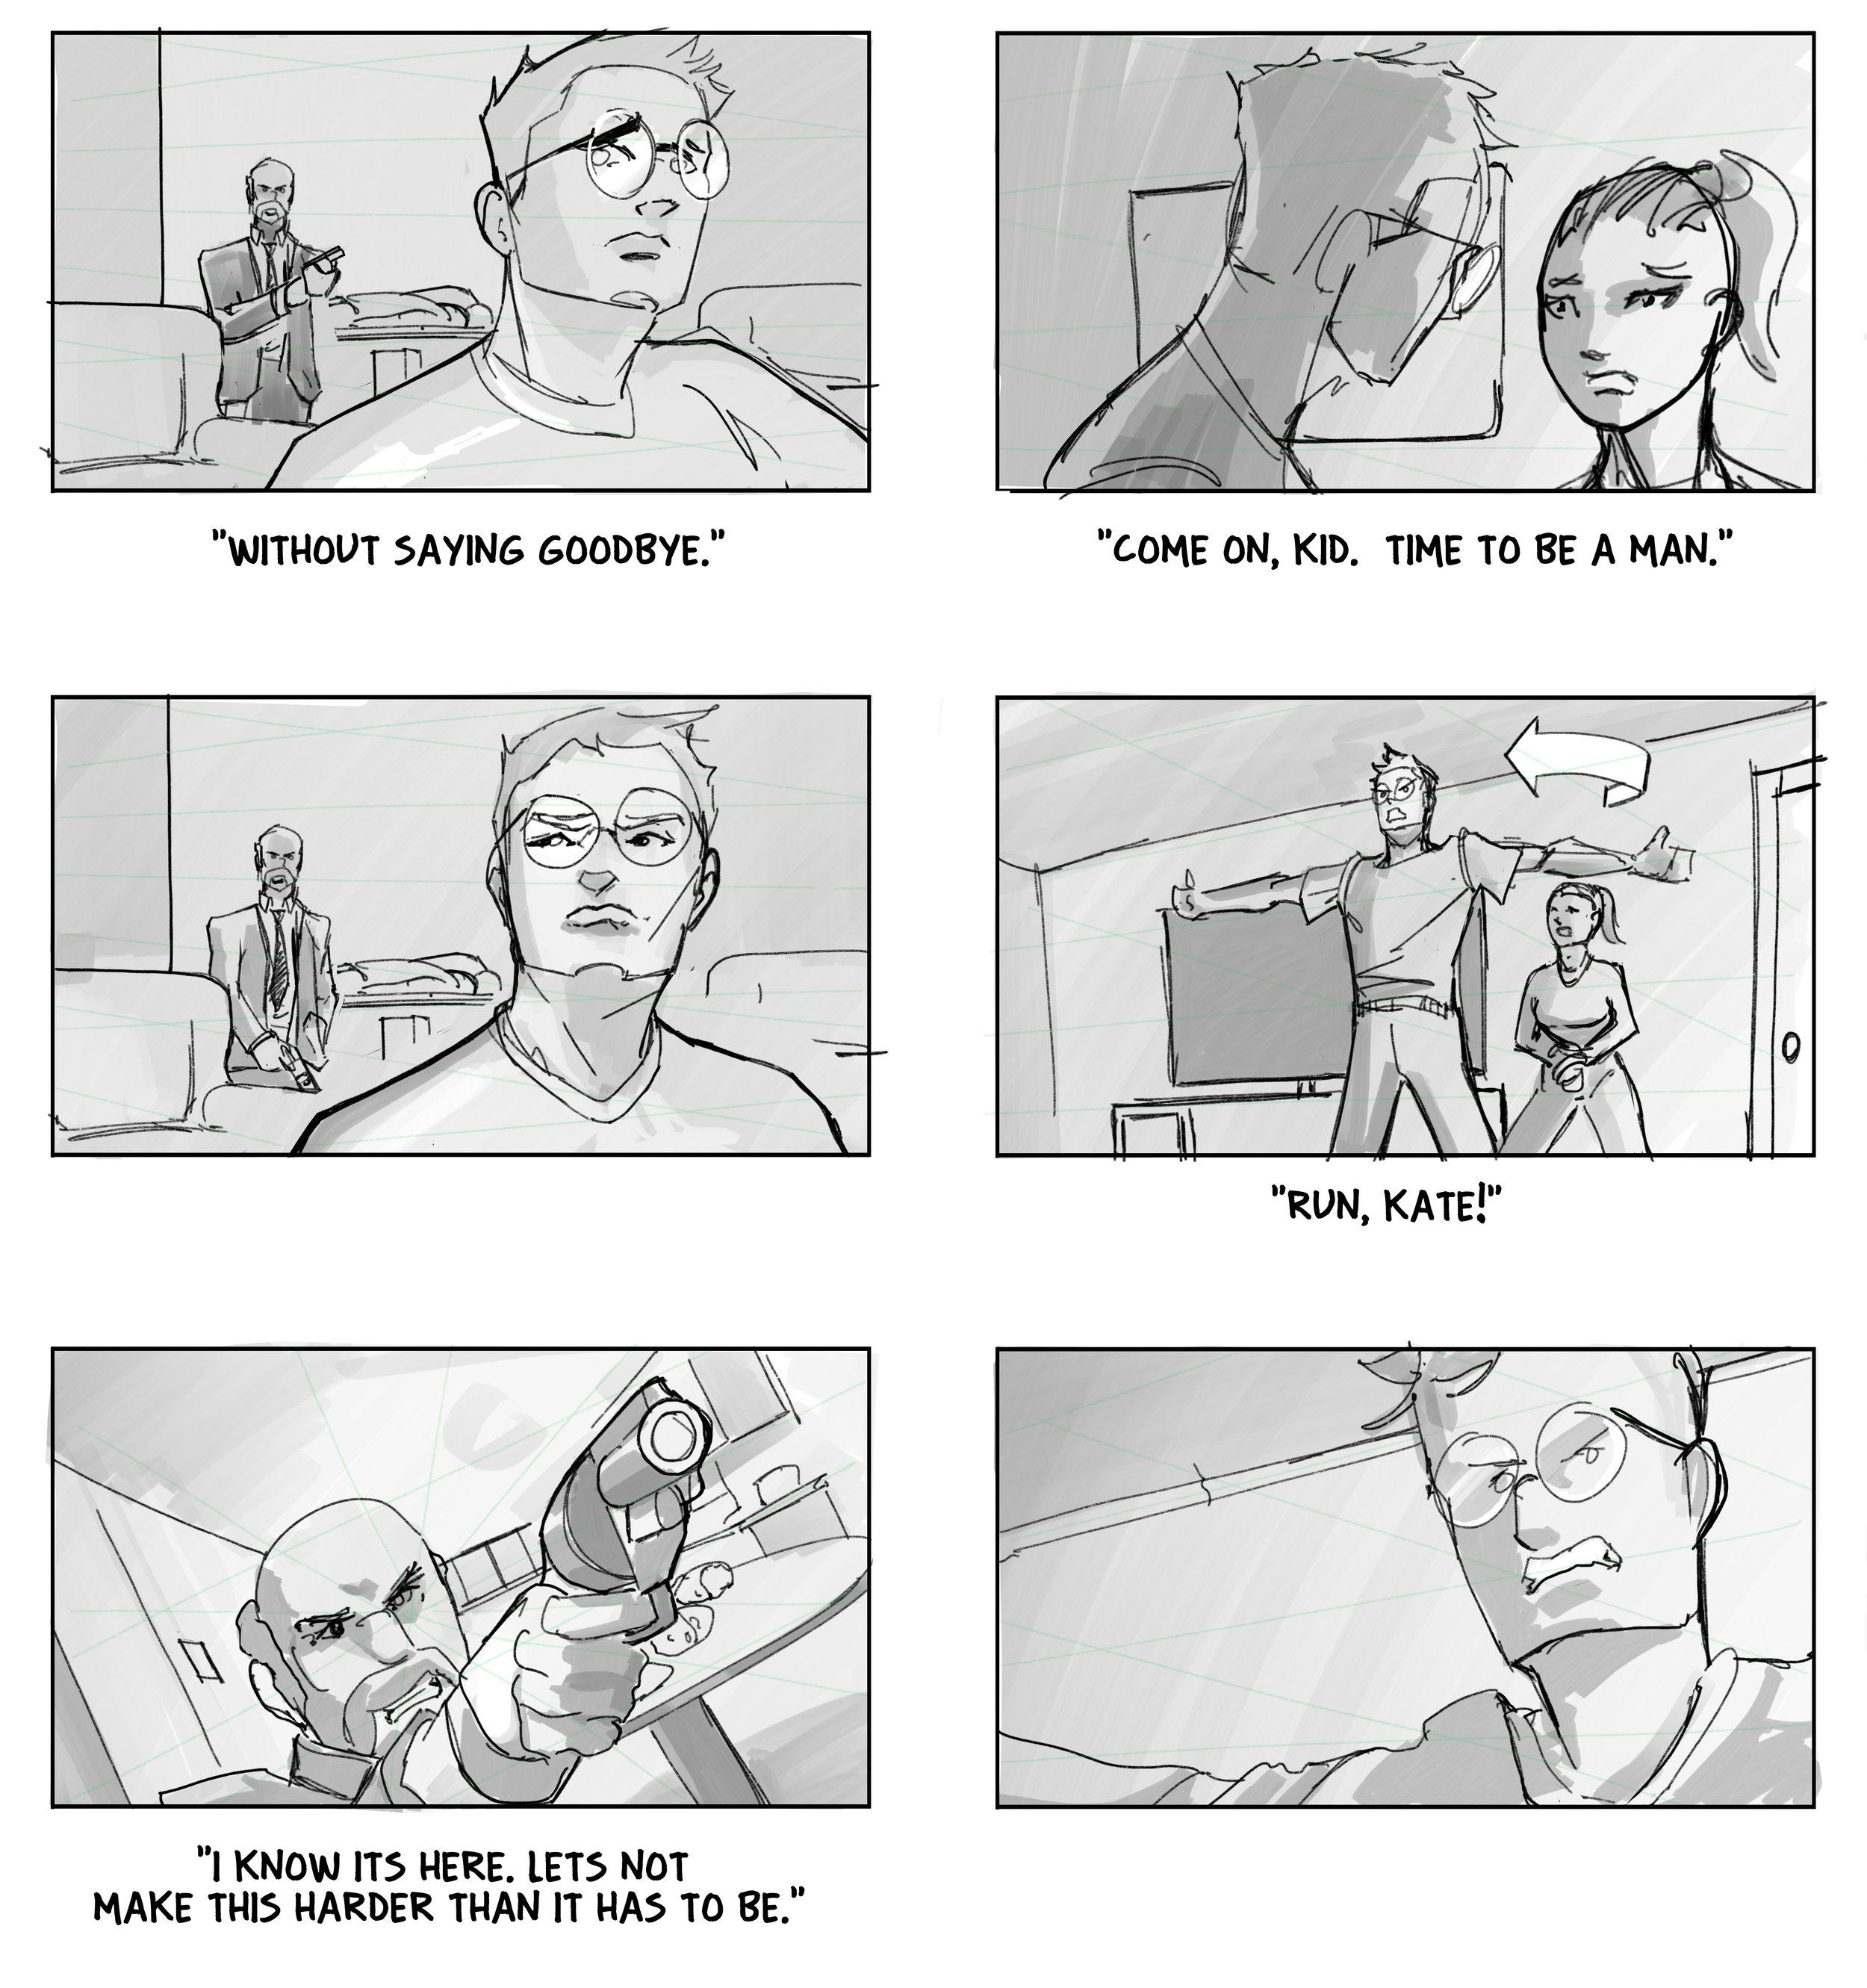 SAM_BS_Catapano_Storyboards_016.jpg